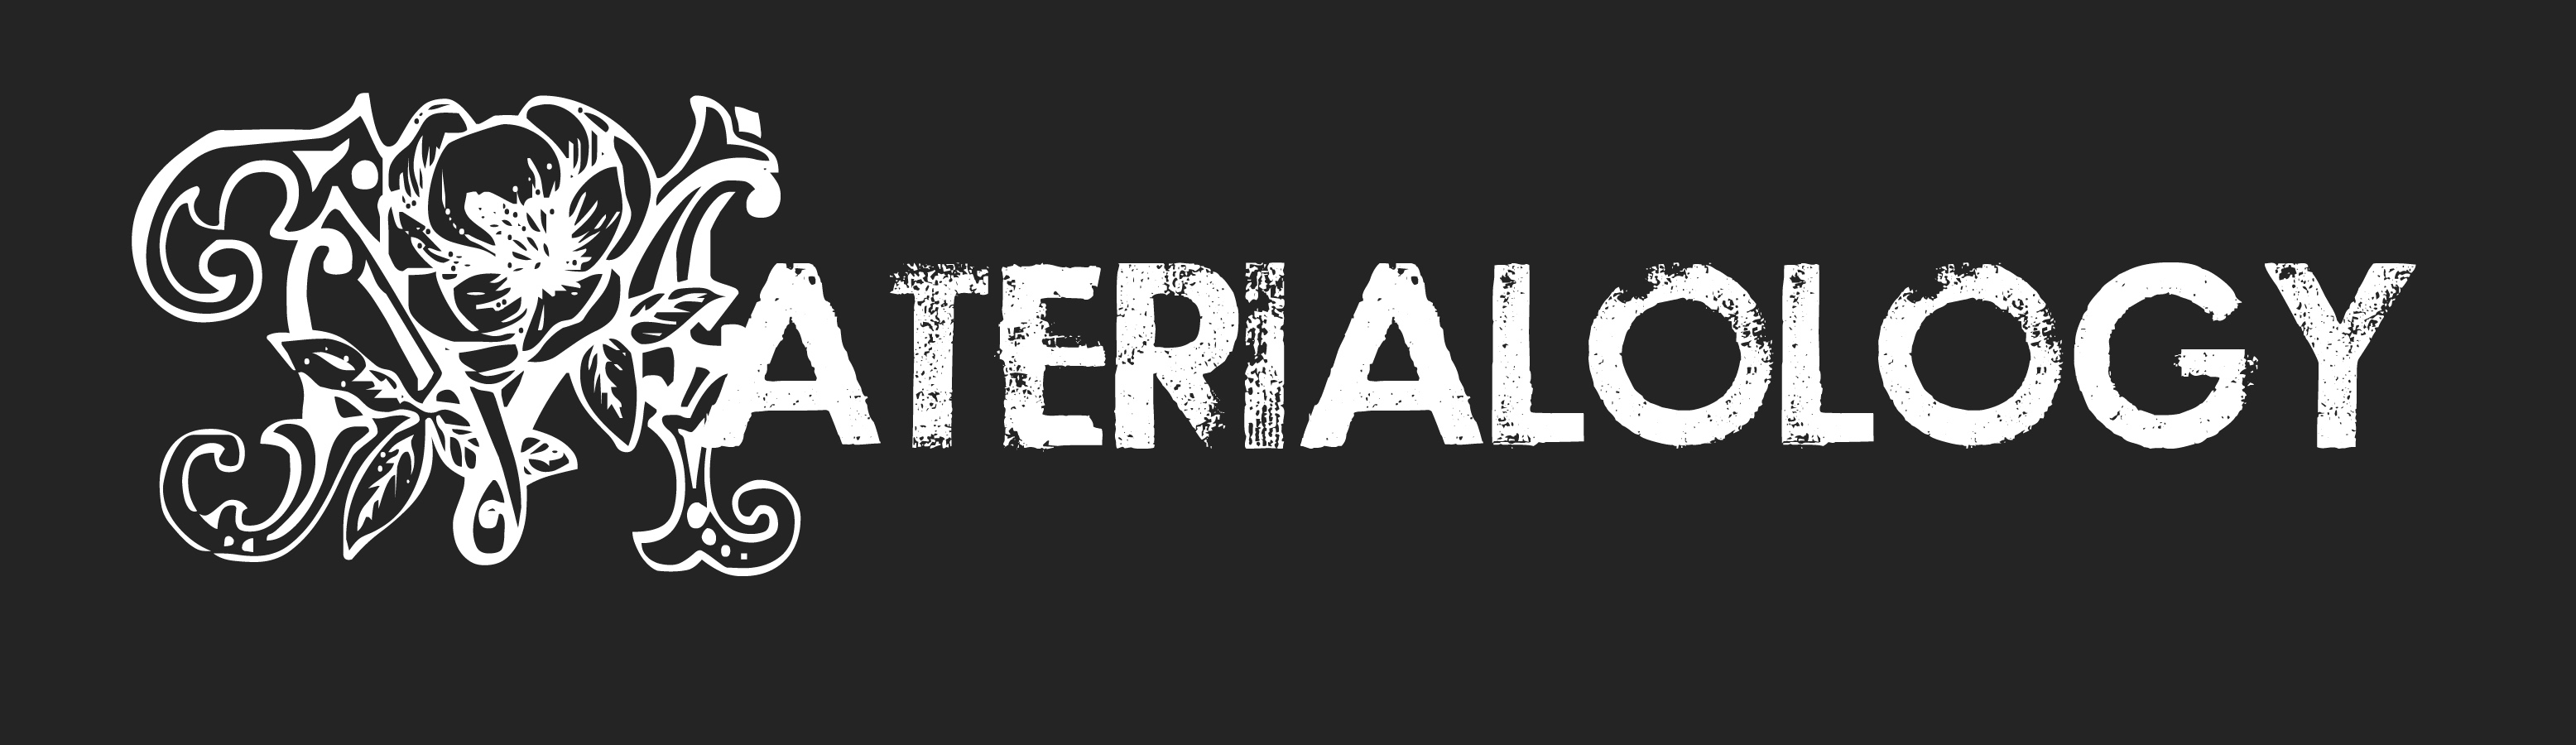 Materialology